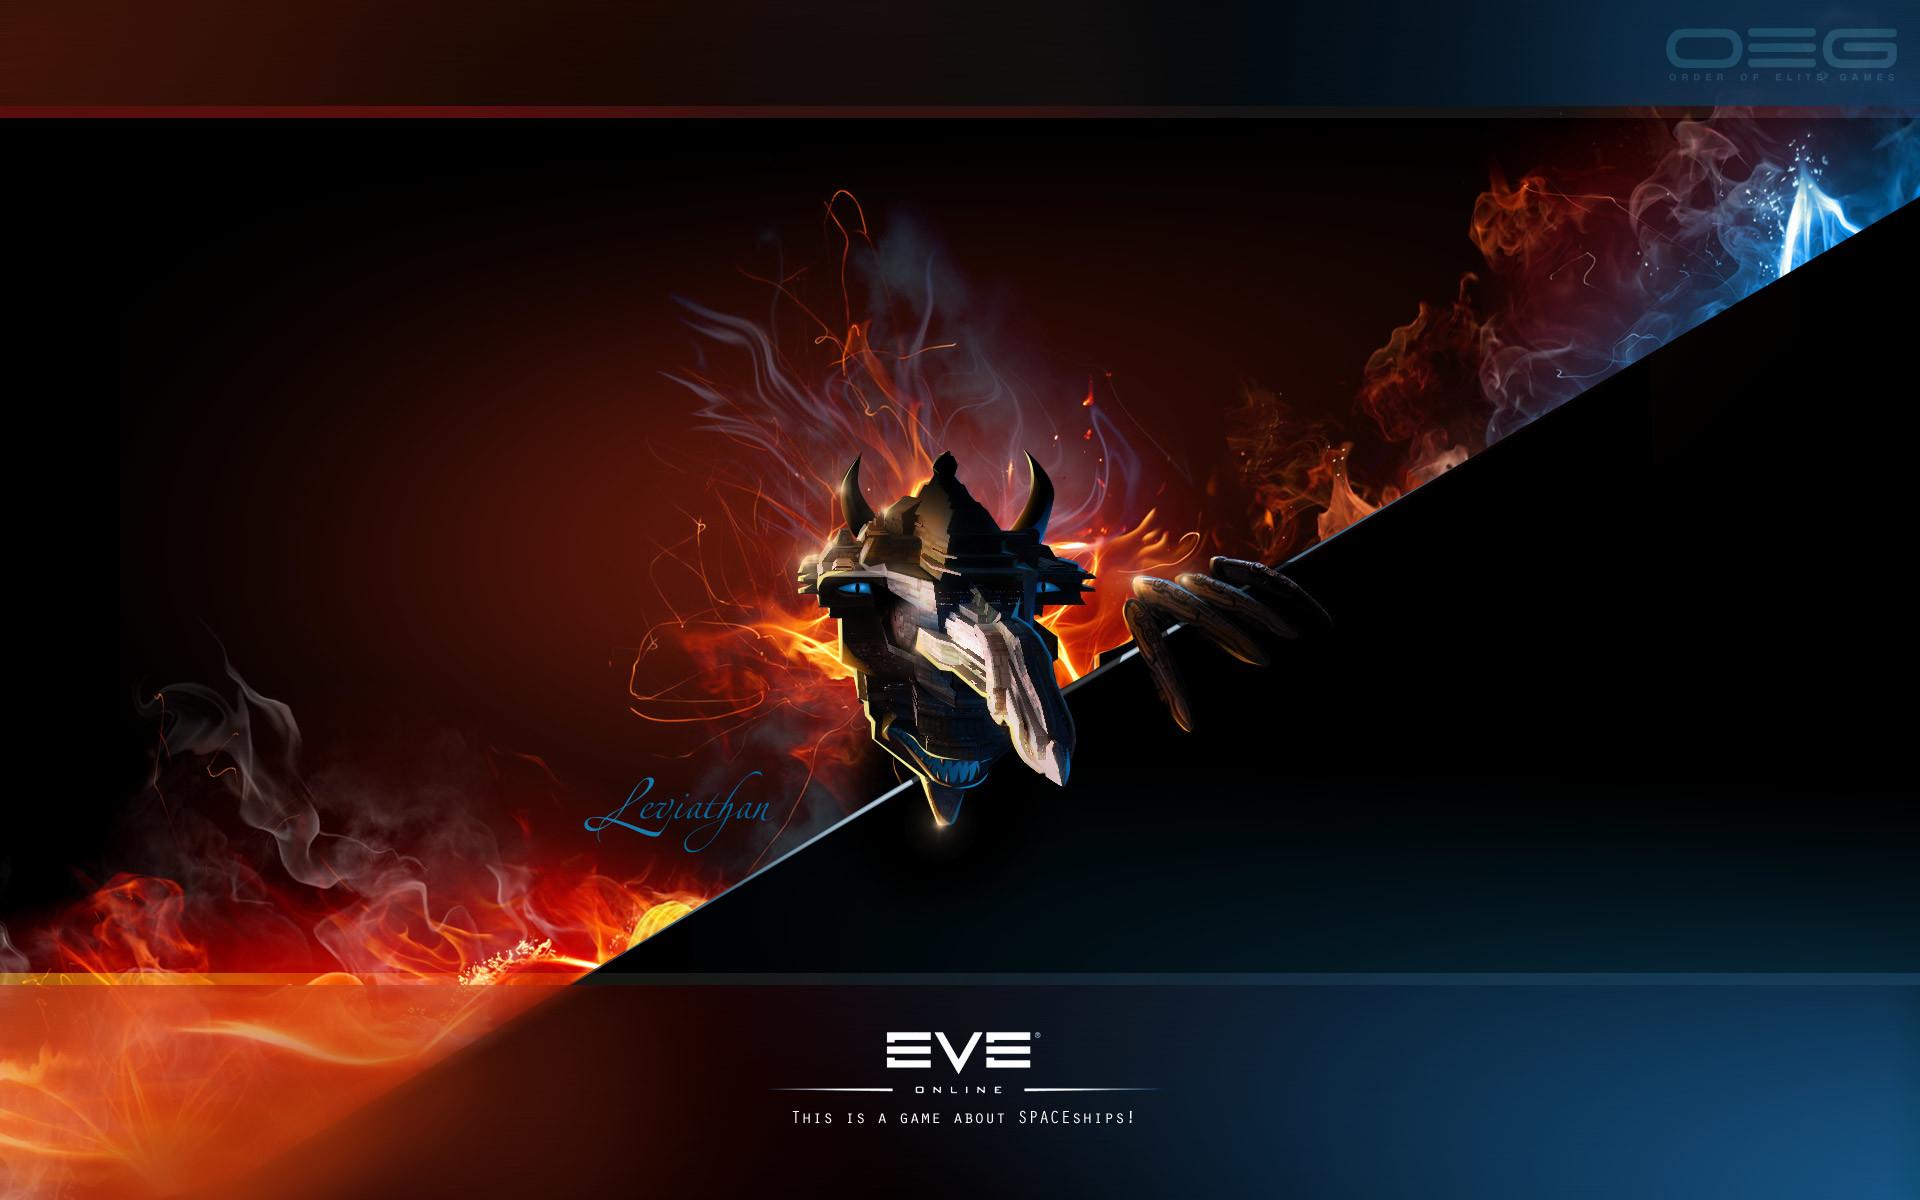 Free eve online wallpaper background